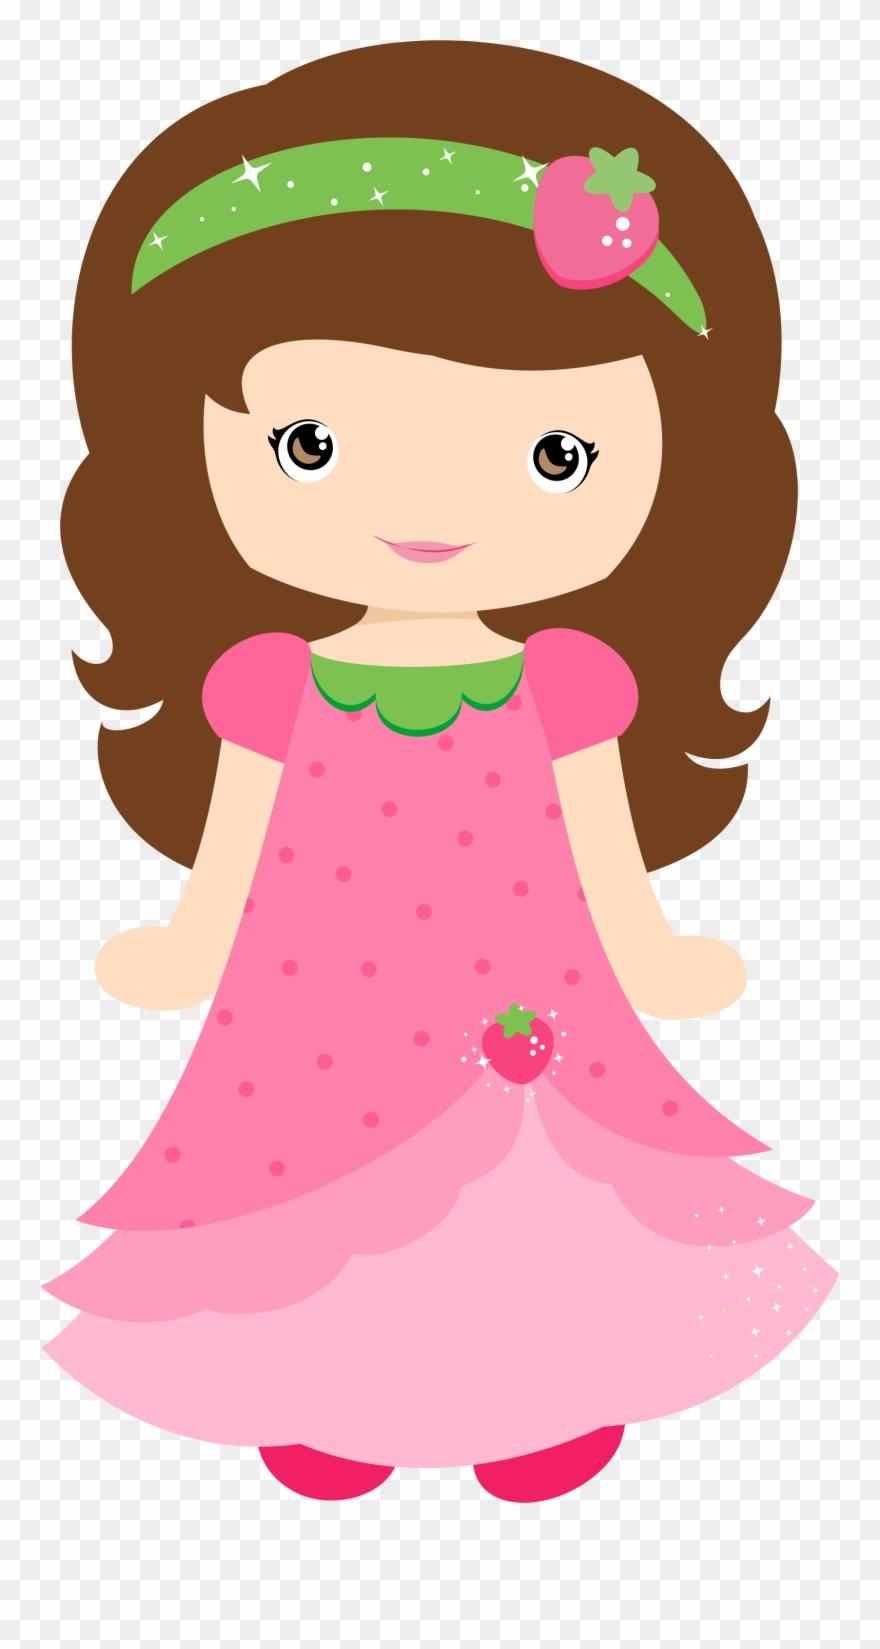 medium resolution of cute clipart girl clipart cute dolls cute kids desenho de boneca